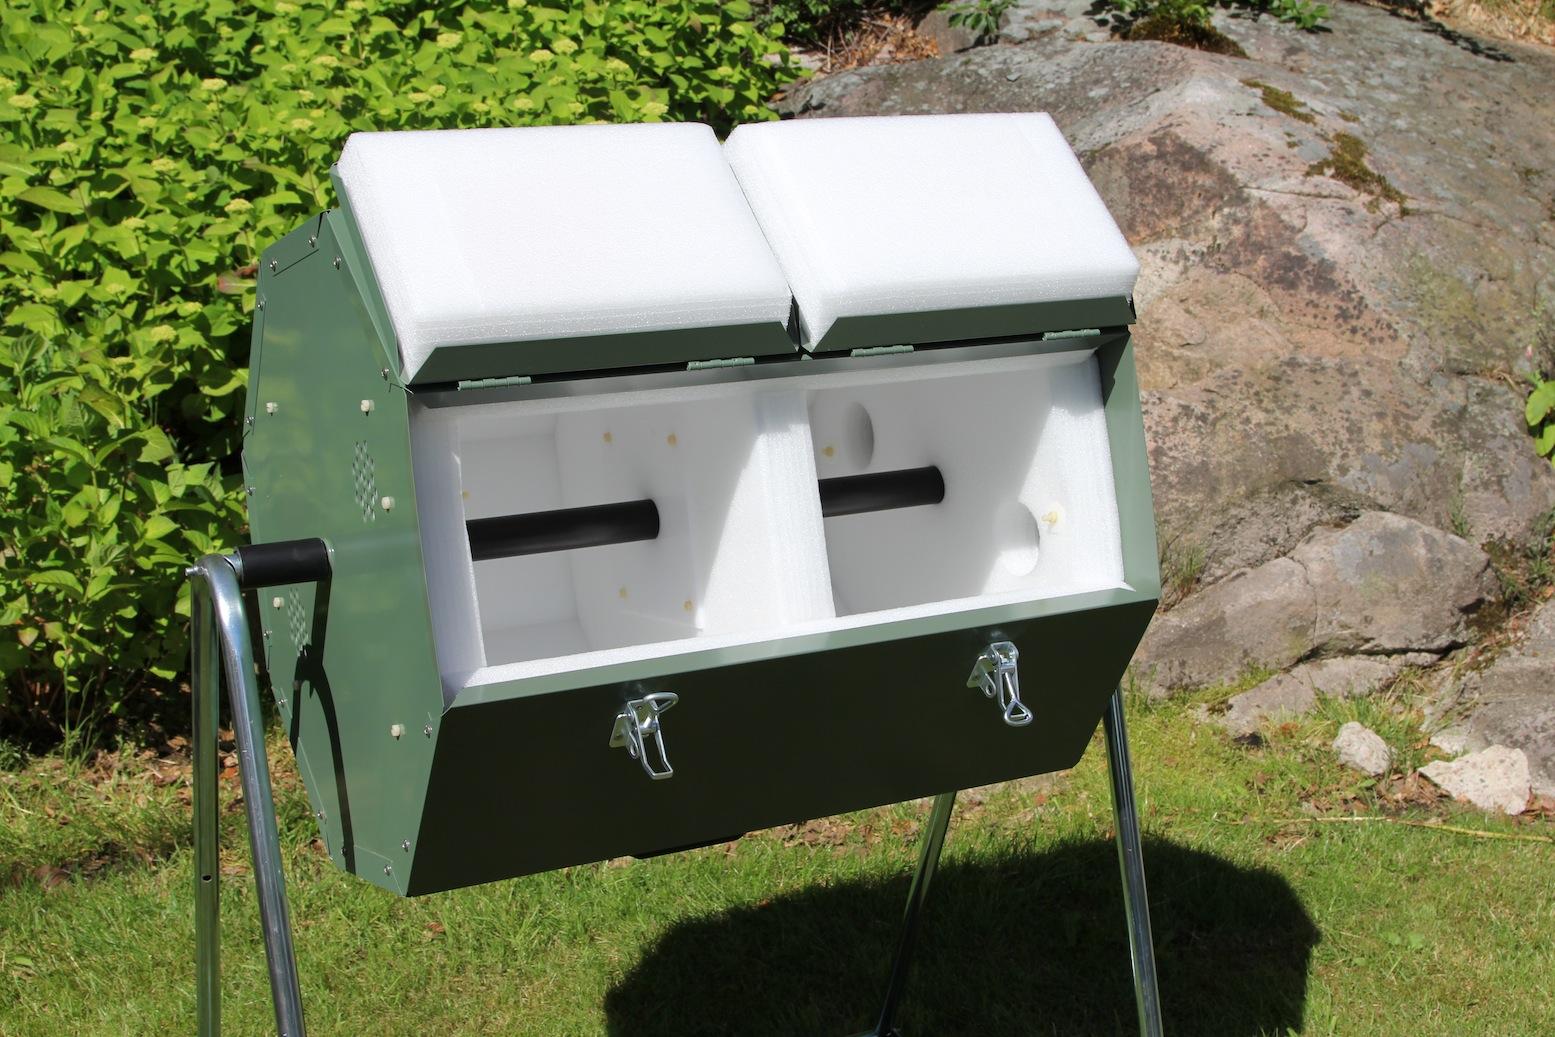 jora-composter-jk-125-jk-270.jpg